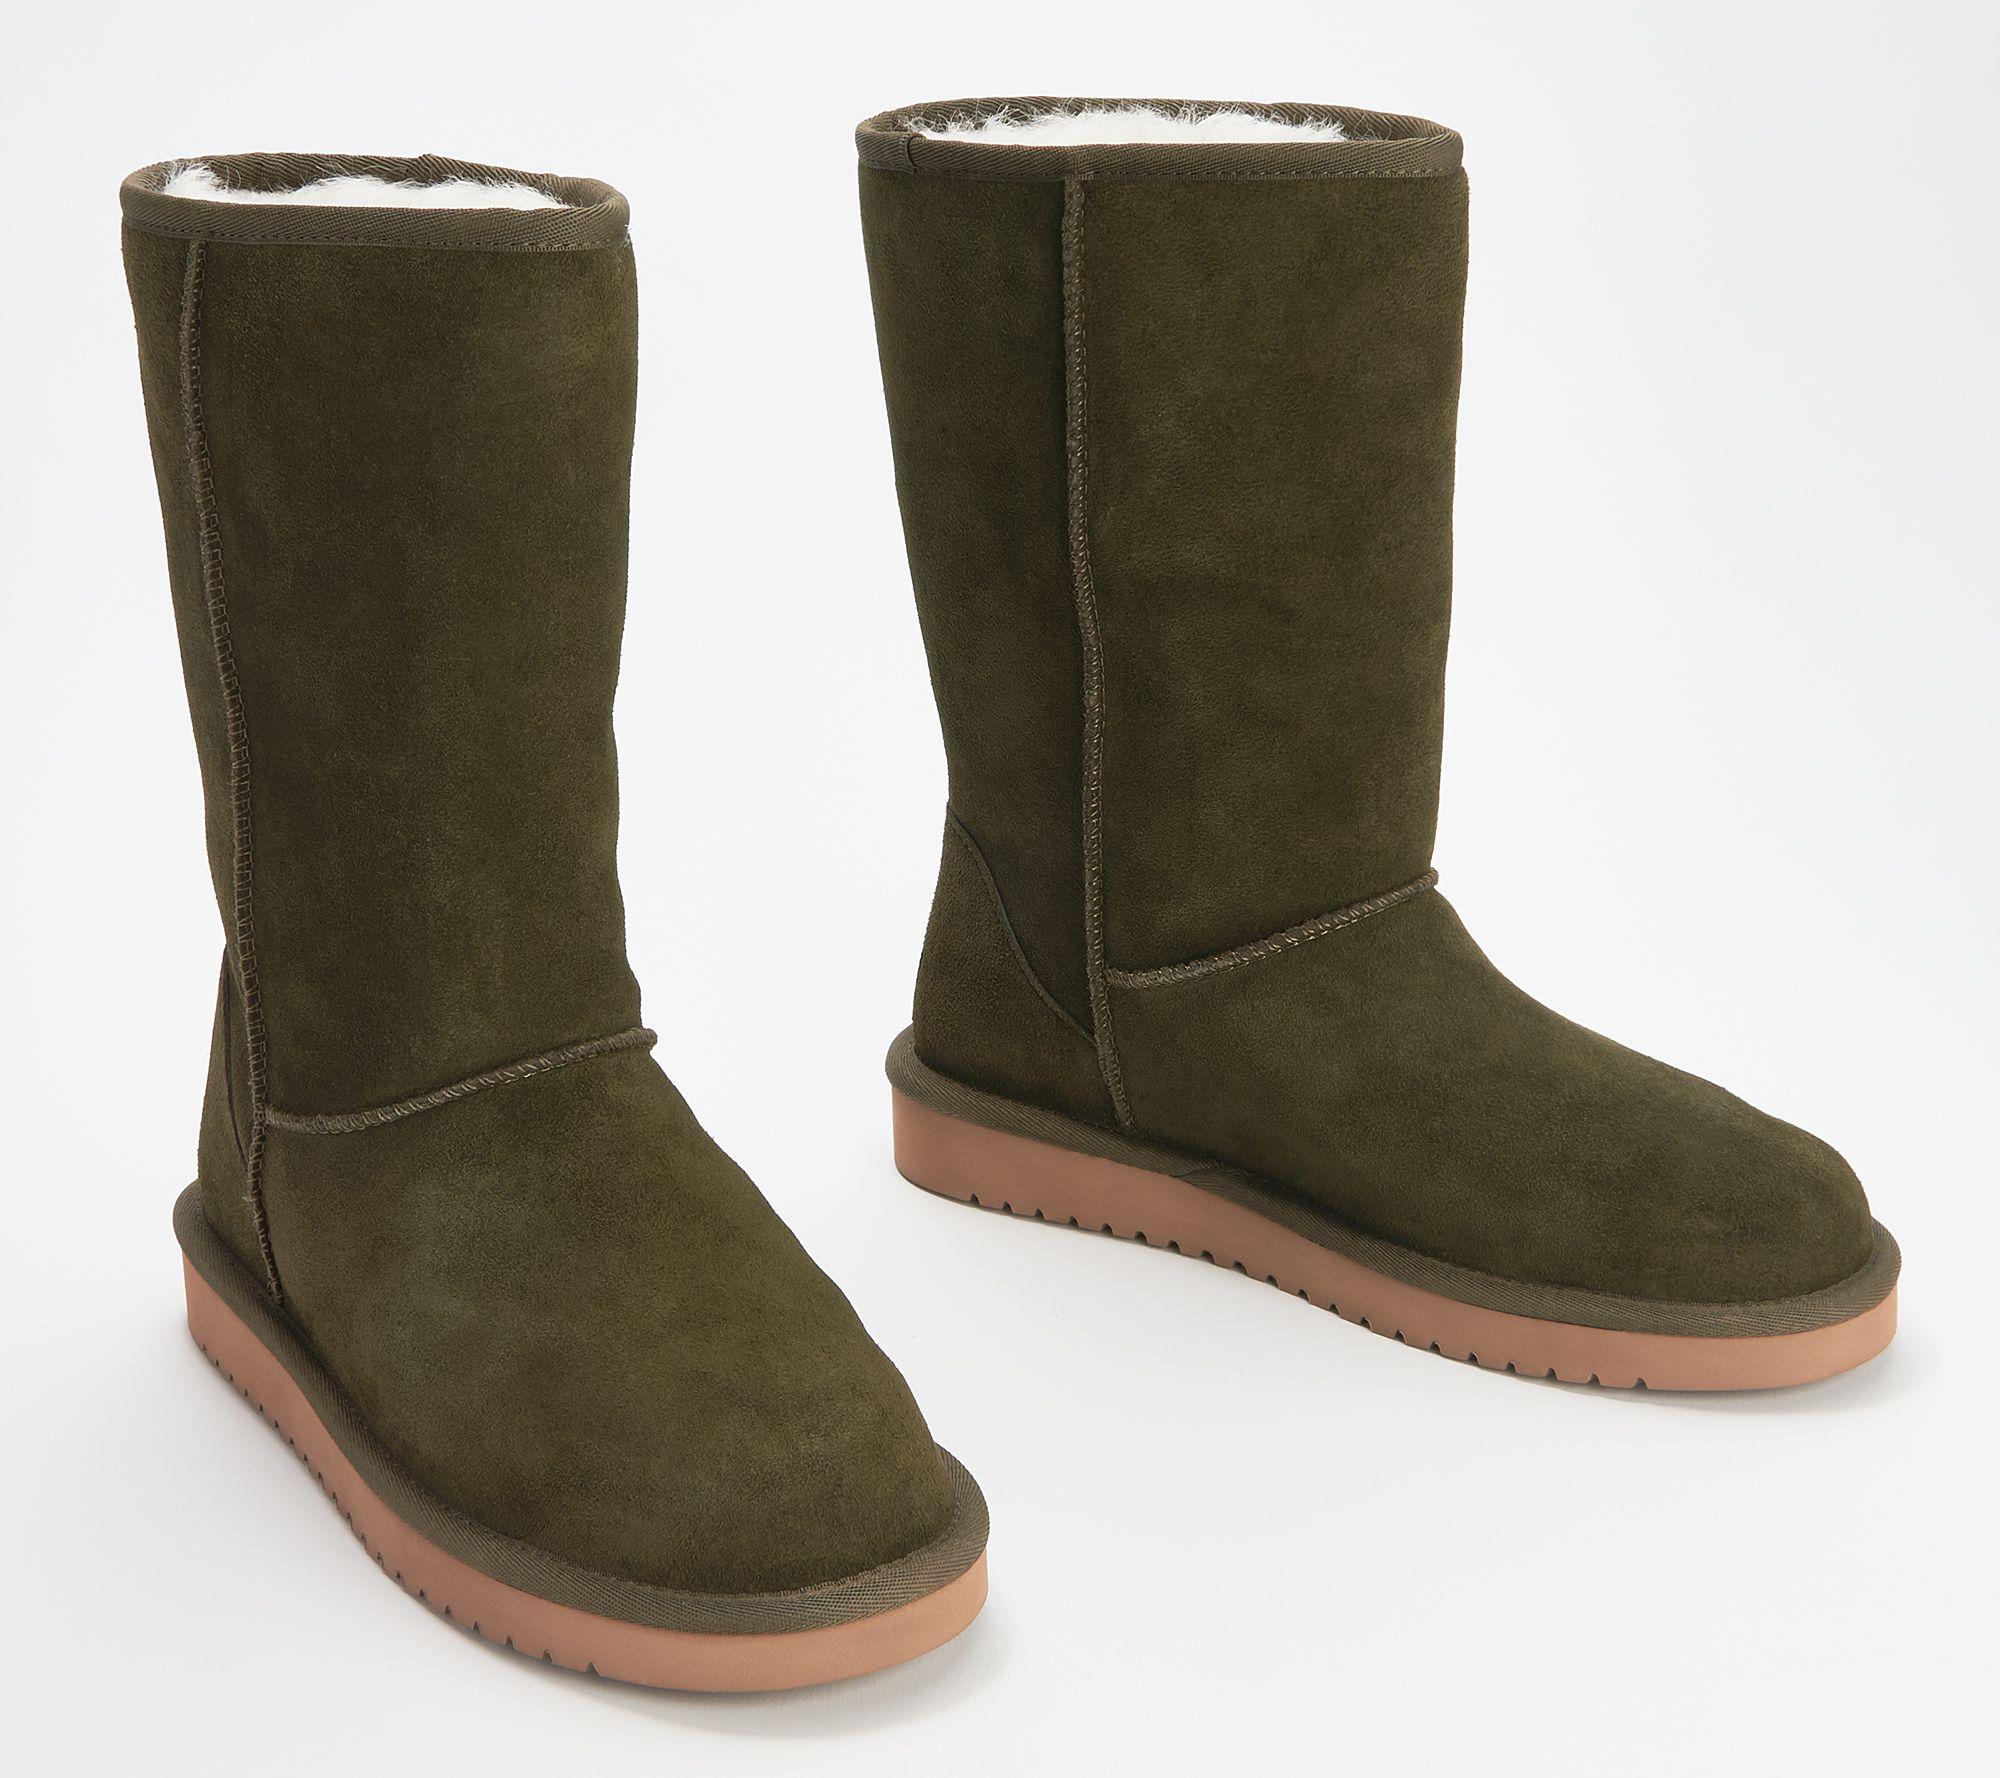 Koolaburra by UGG Suede Tall Boots - Koola - QVC.com